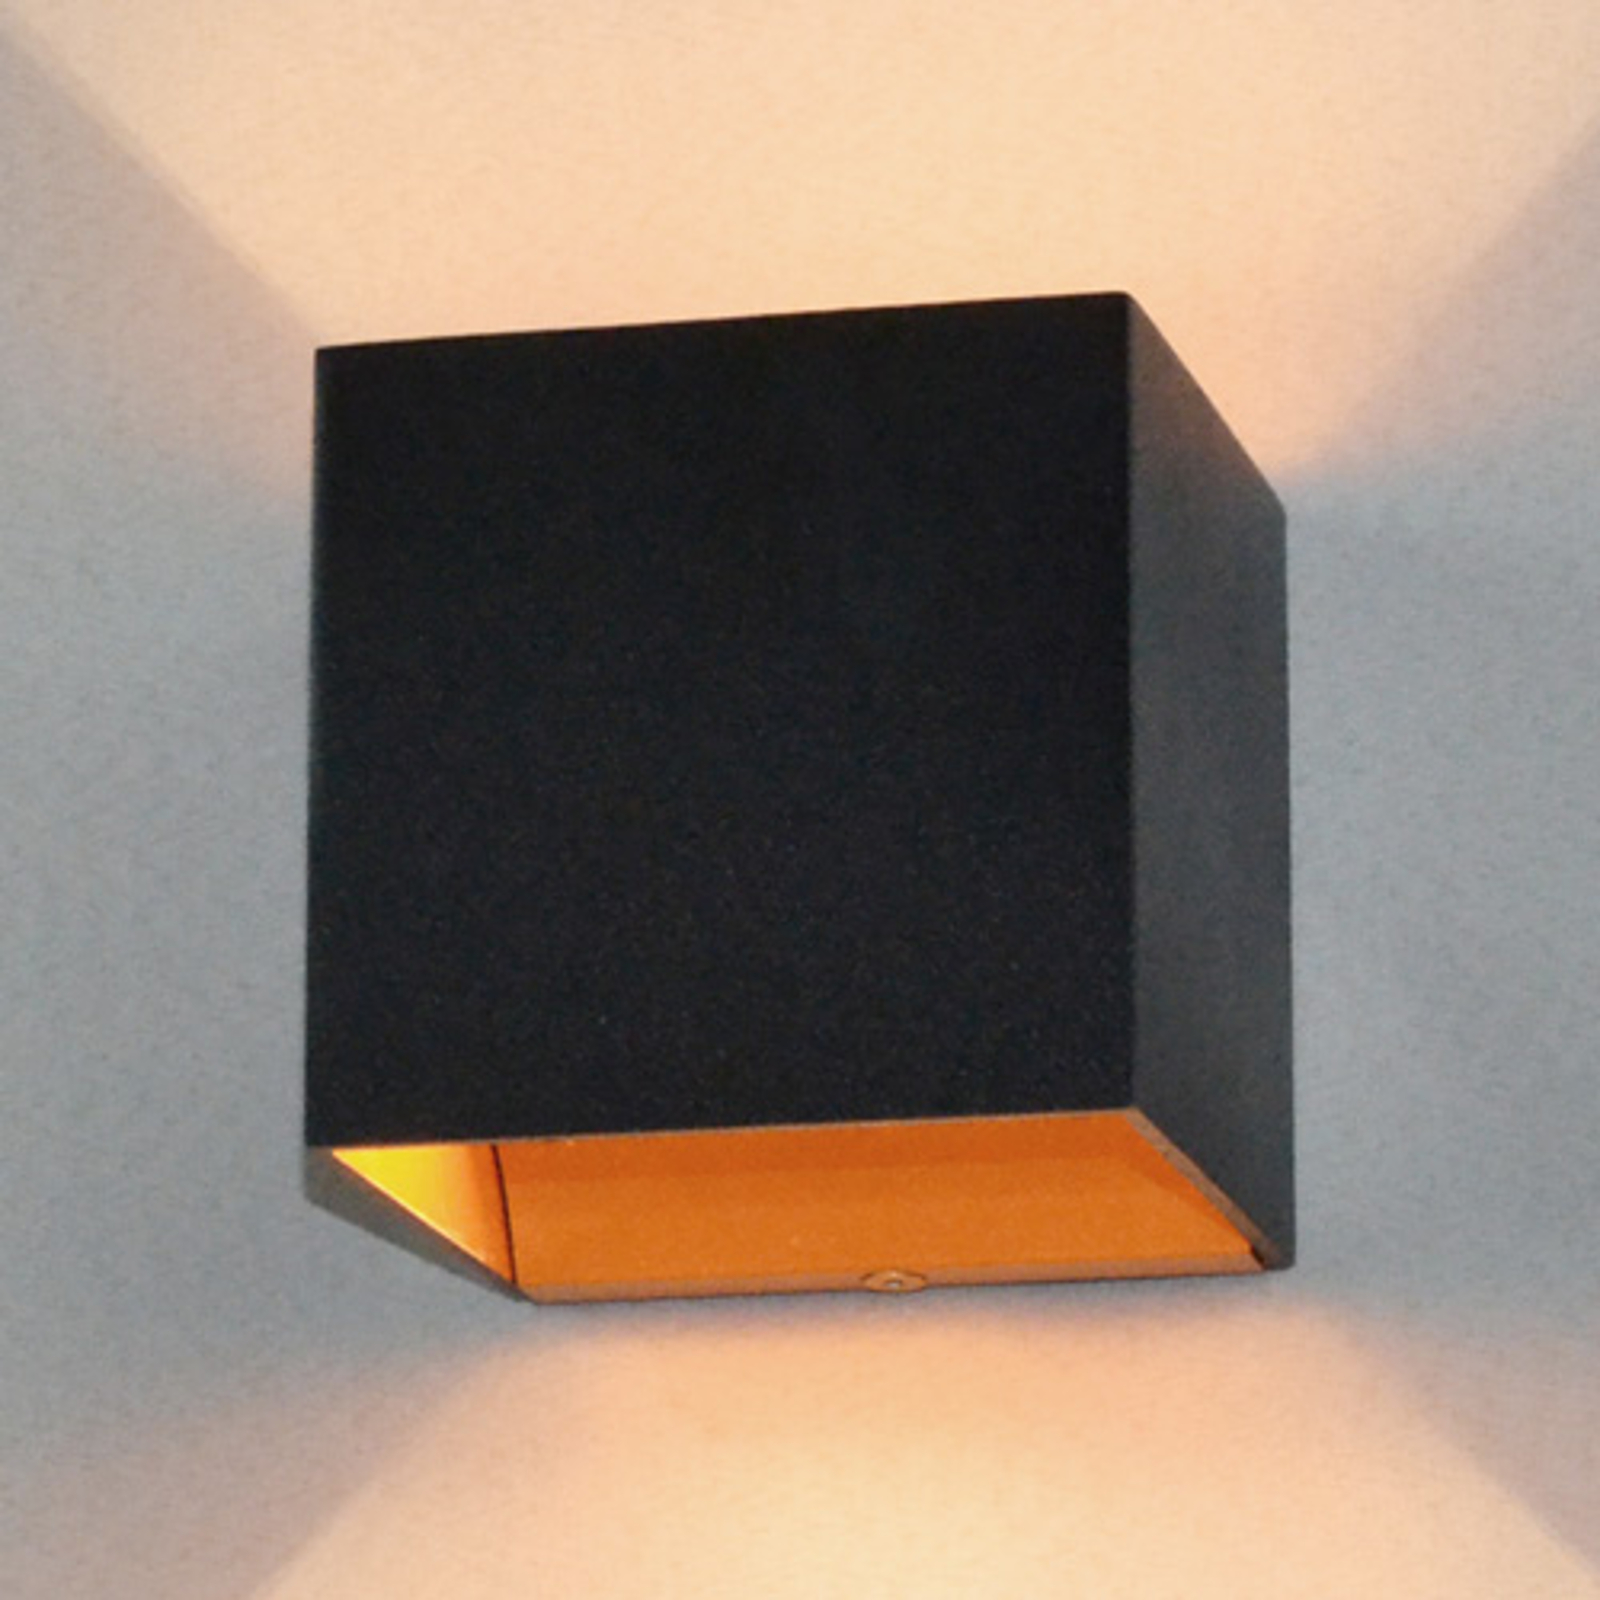 Schwarze LED-Wandlampe Aldrina, innen goldfarben